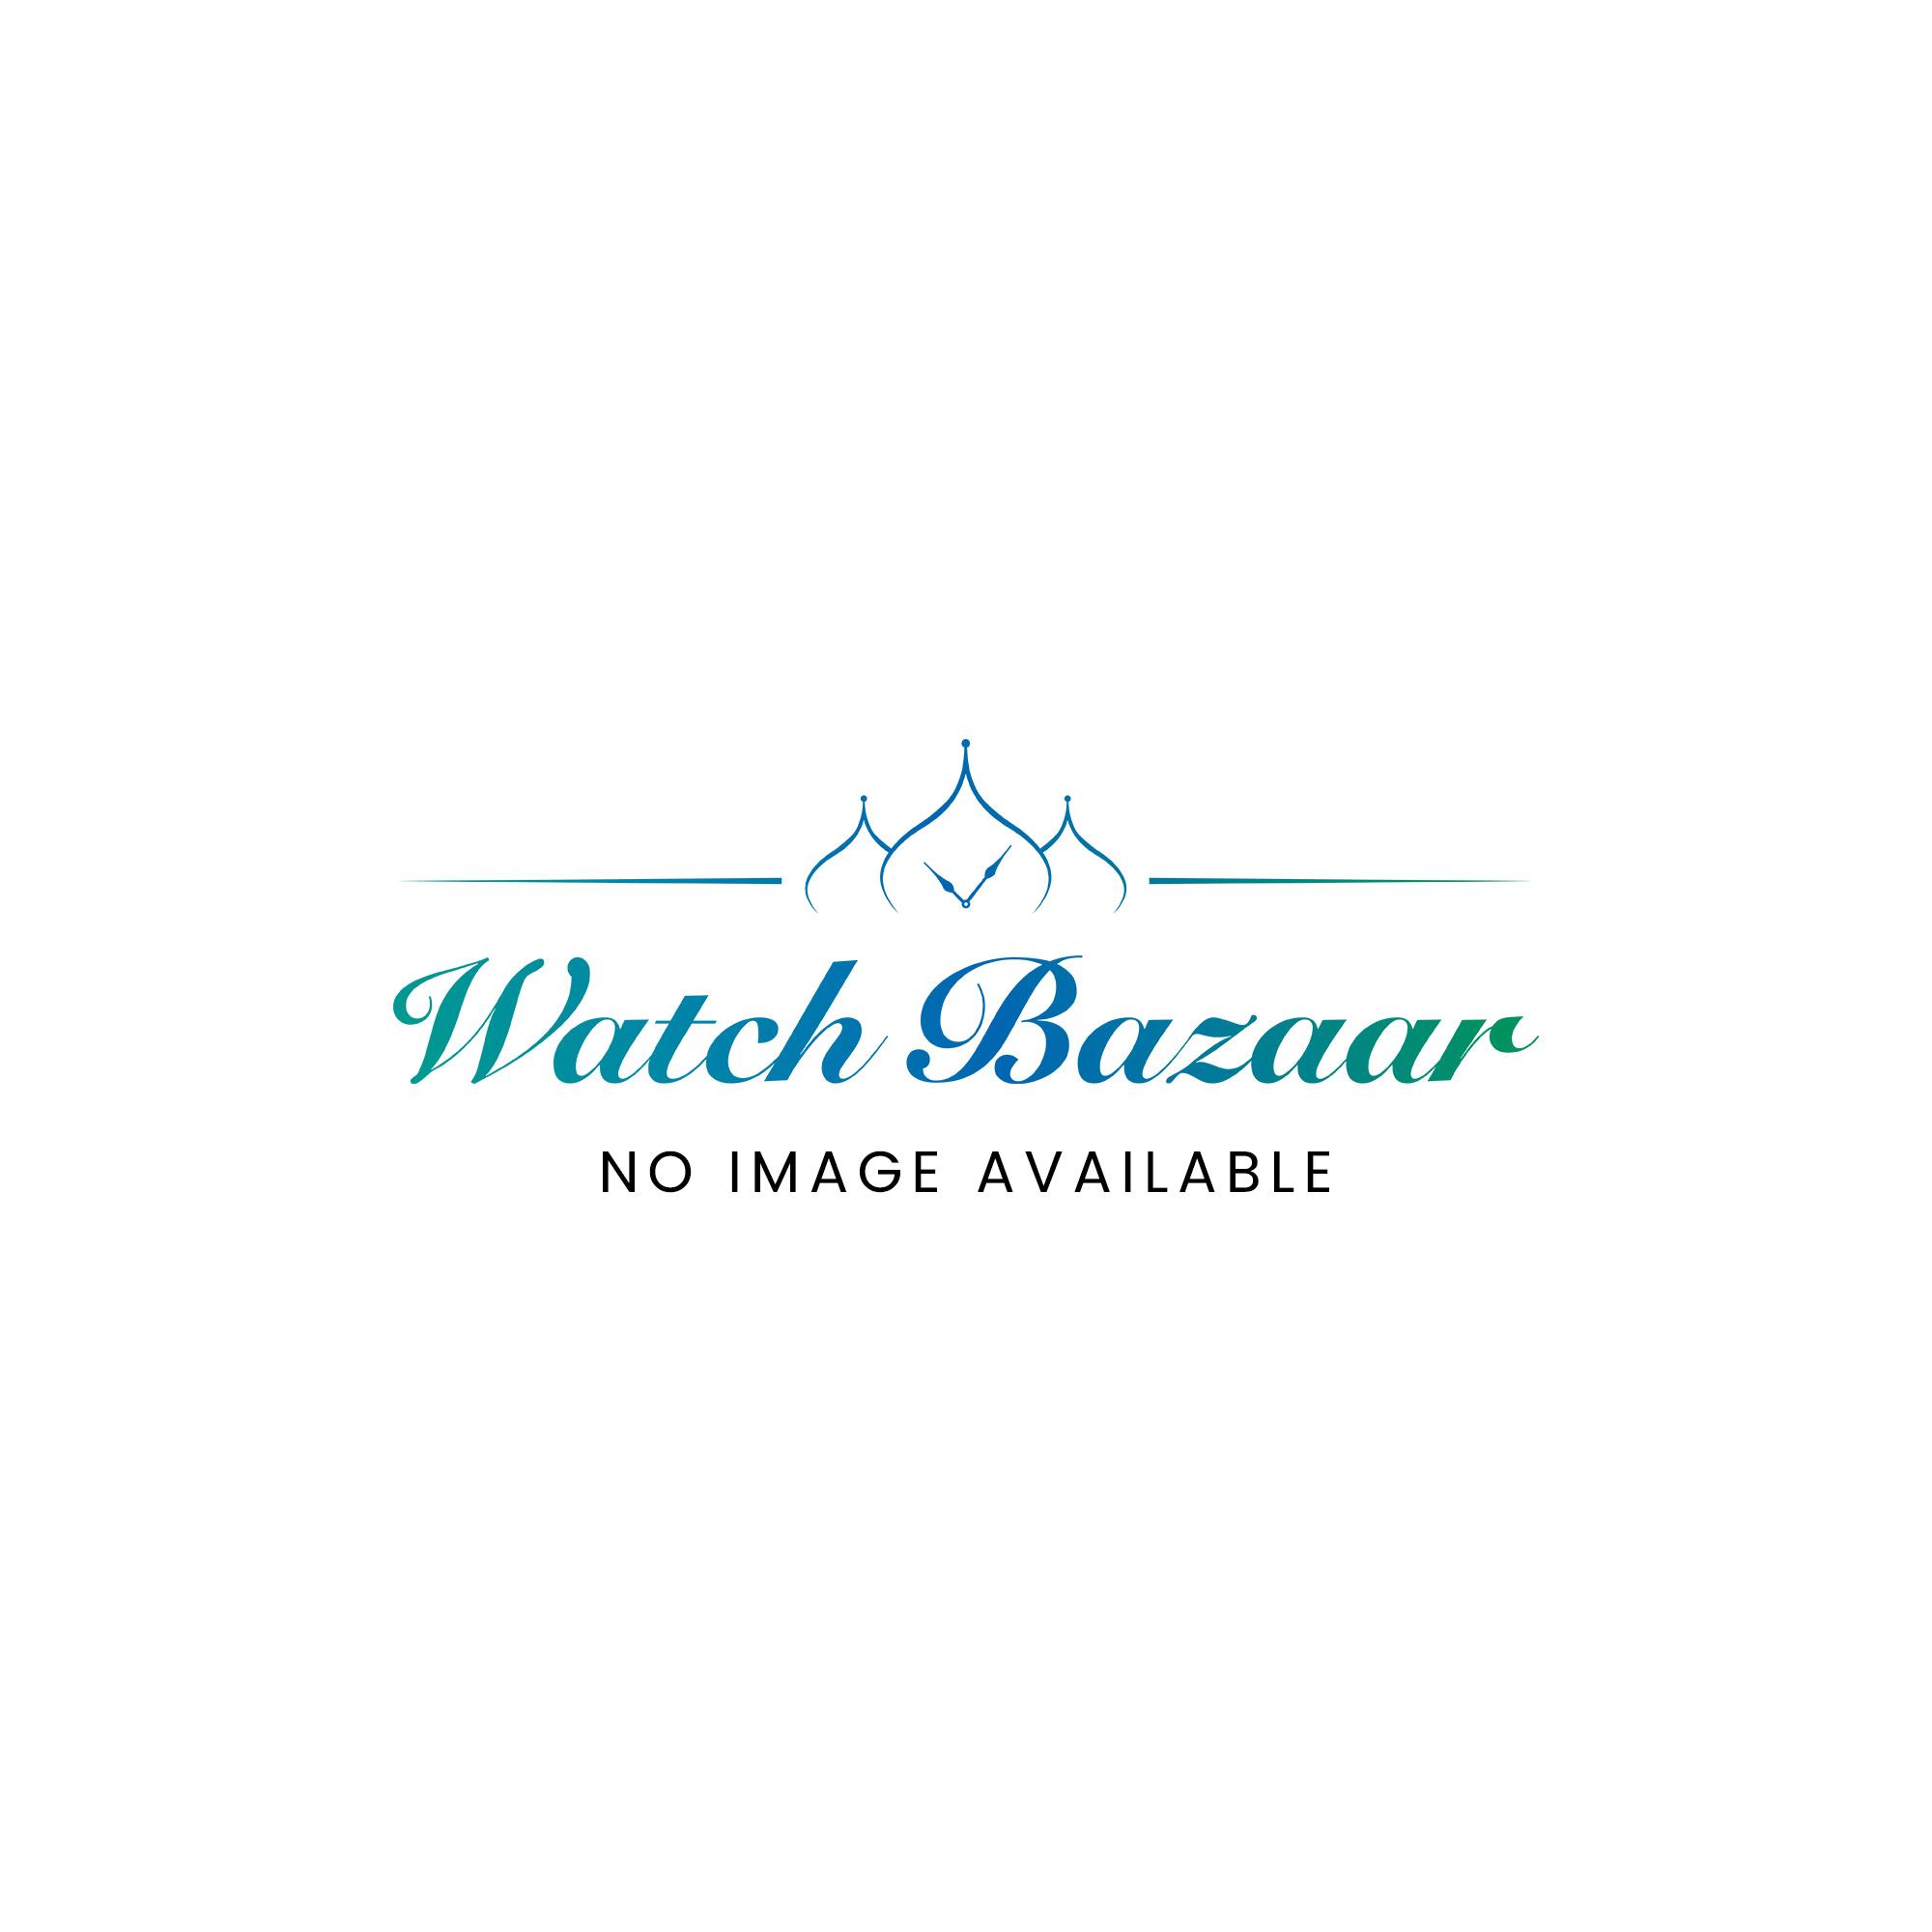 e3094c5bb6bc Michael Kors MK8361 Mens Gage Watch - Mens Watches from Watch Bazaar UK